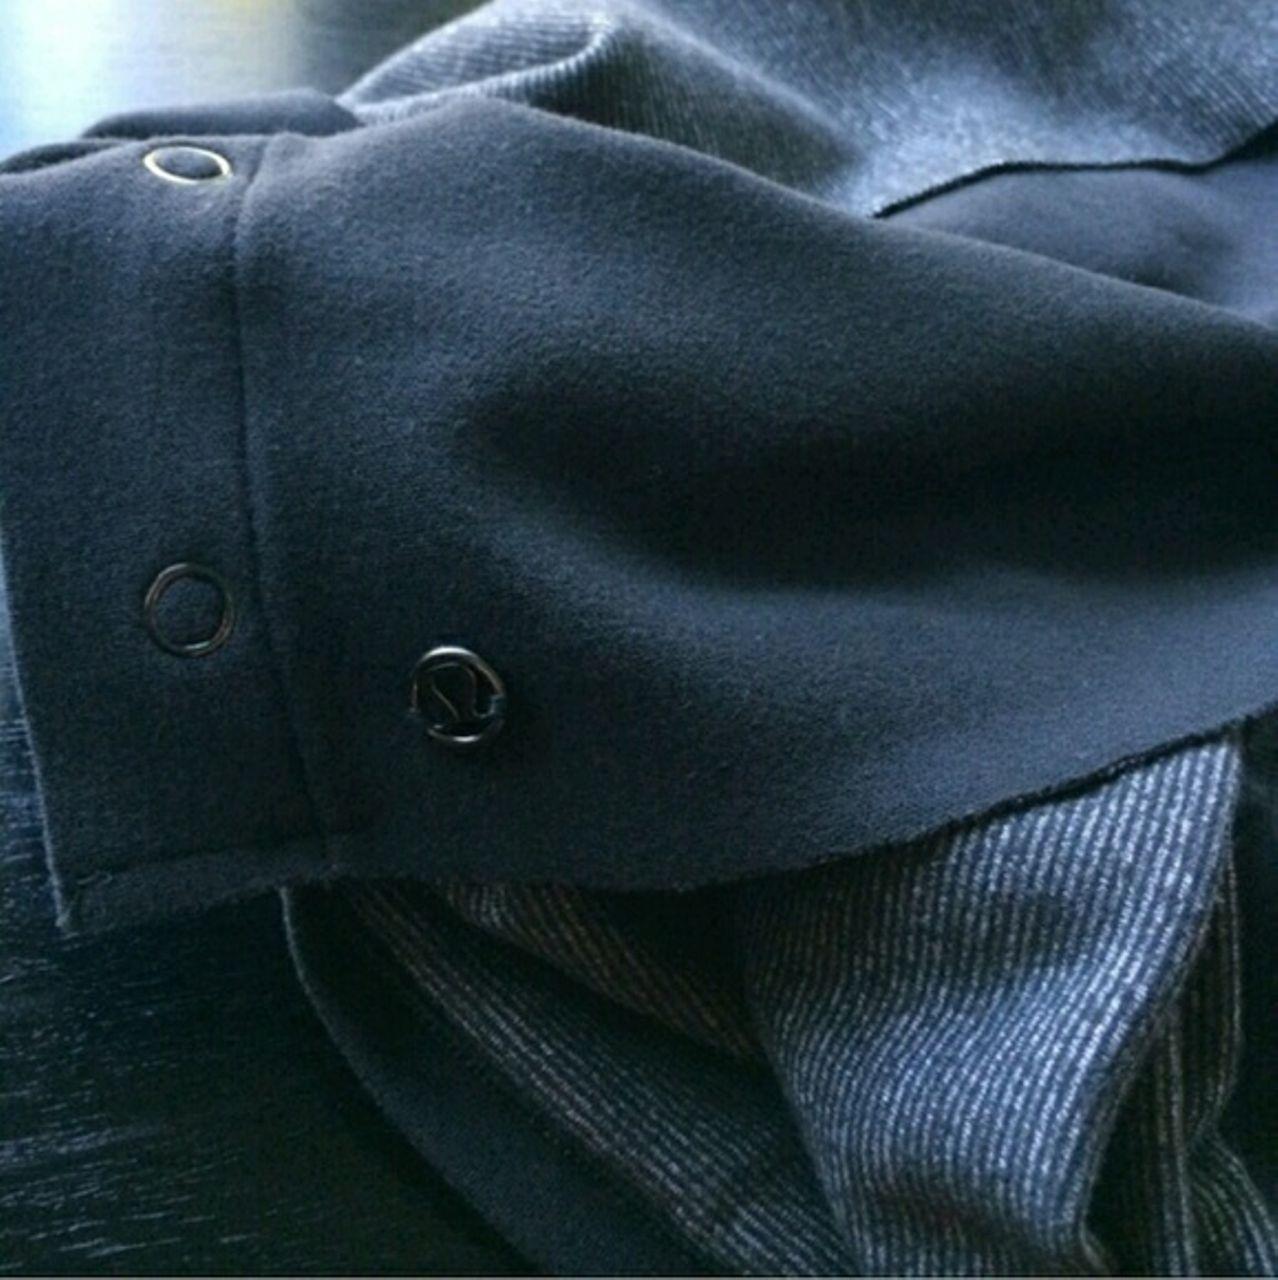 Lululemon Vinyasa Scarf *Rulu - Wee Stripe Black White / Black